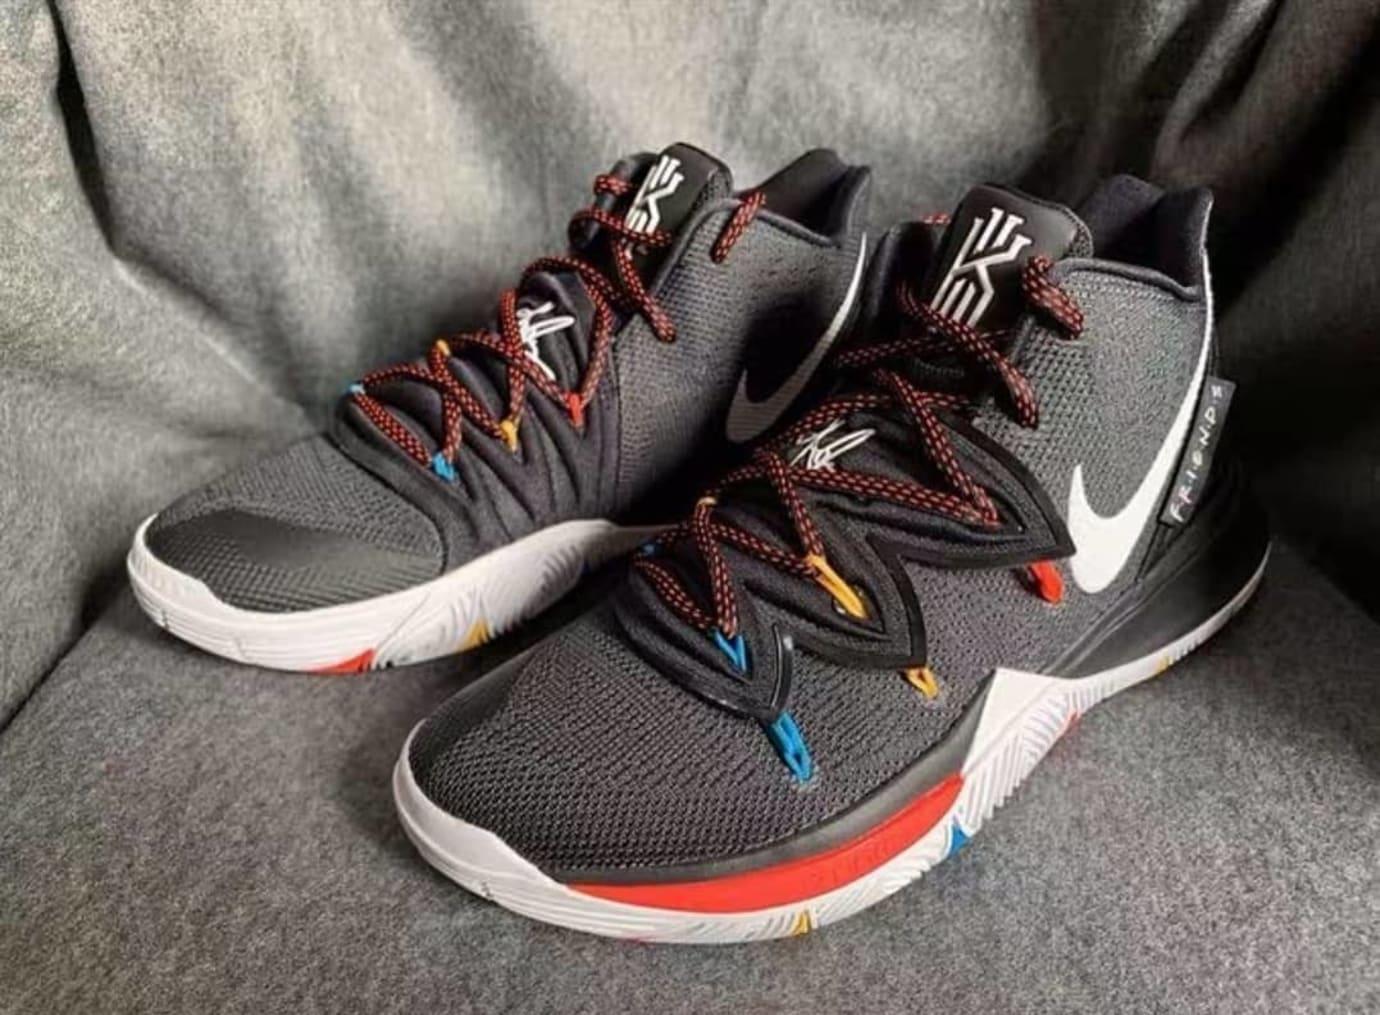 best website 3f0bd 6ddb8 Nike Kyrie 5 Friends (Pair 2)